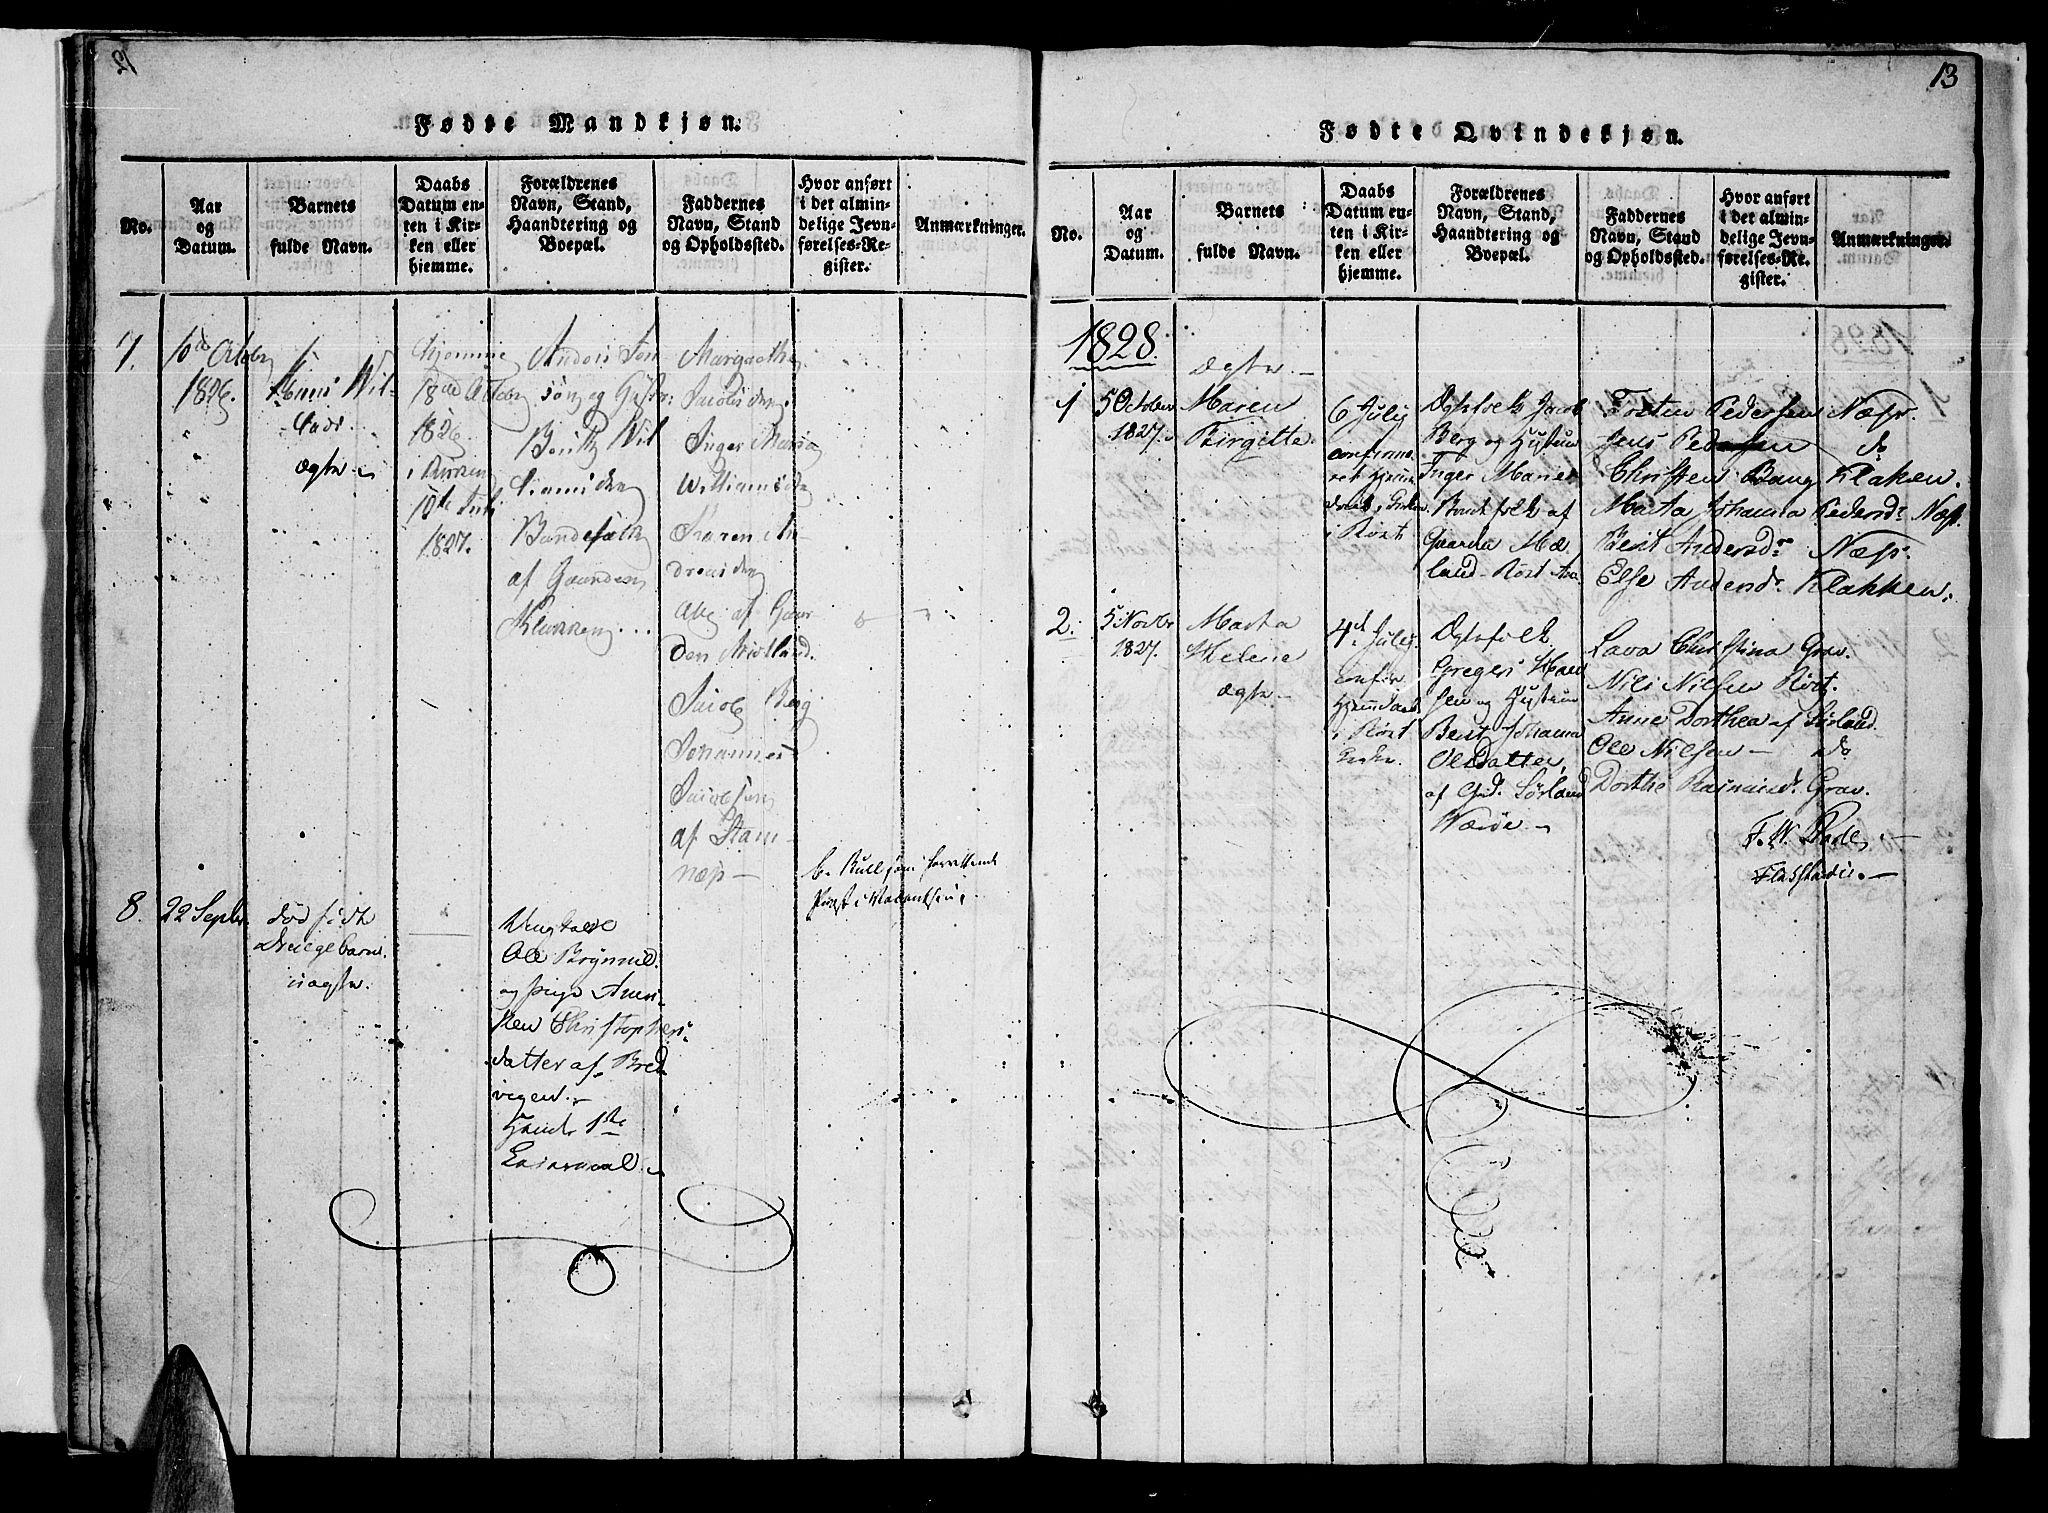 SAT, Ministerialprotokoller, klokkerbøker og fødselsregistre - Nordland, 807/L0120: Ministerialbok nr. 807A03, 1821-1848, s. 13